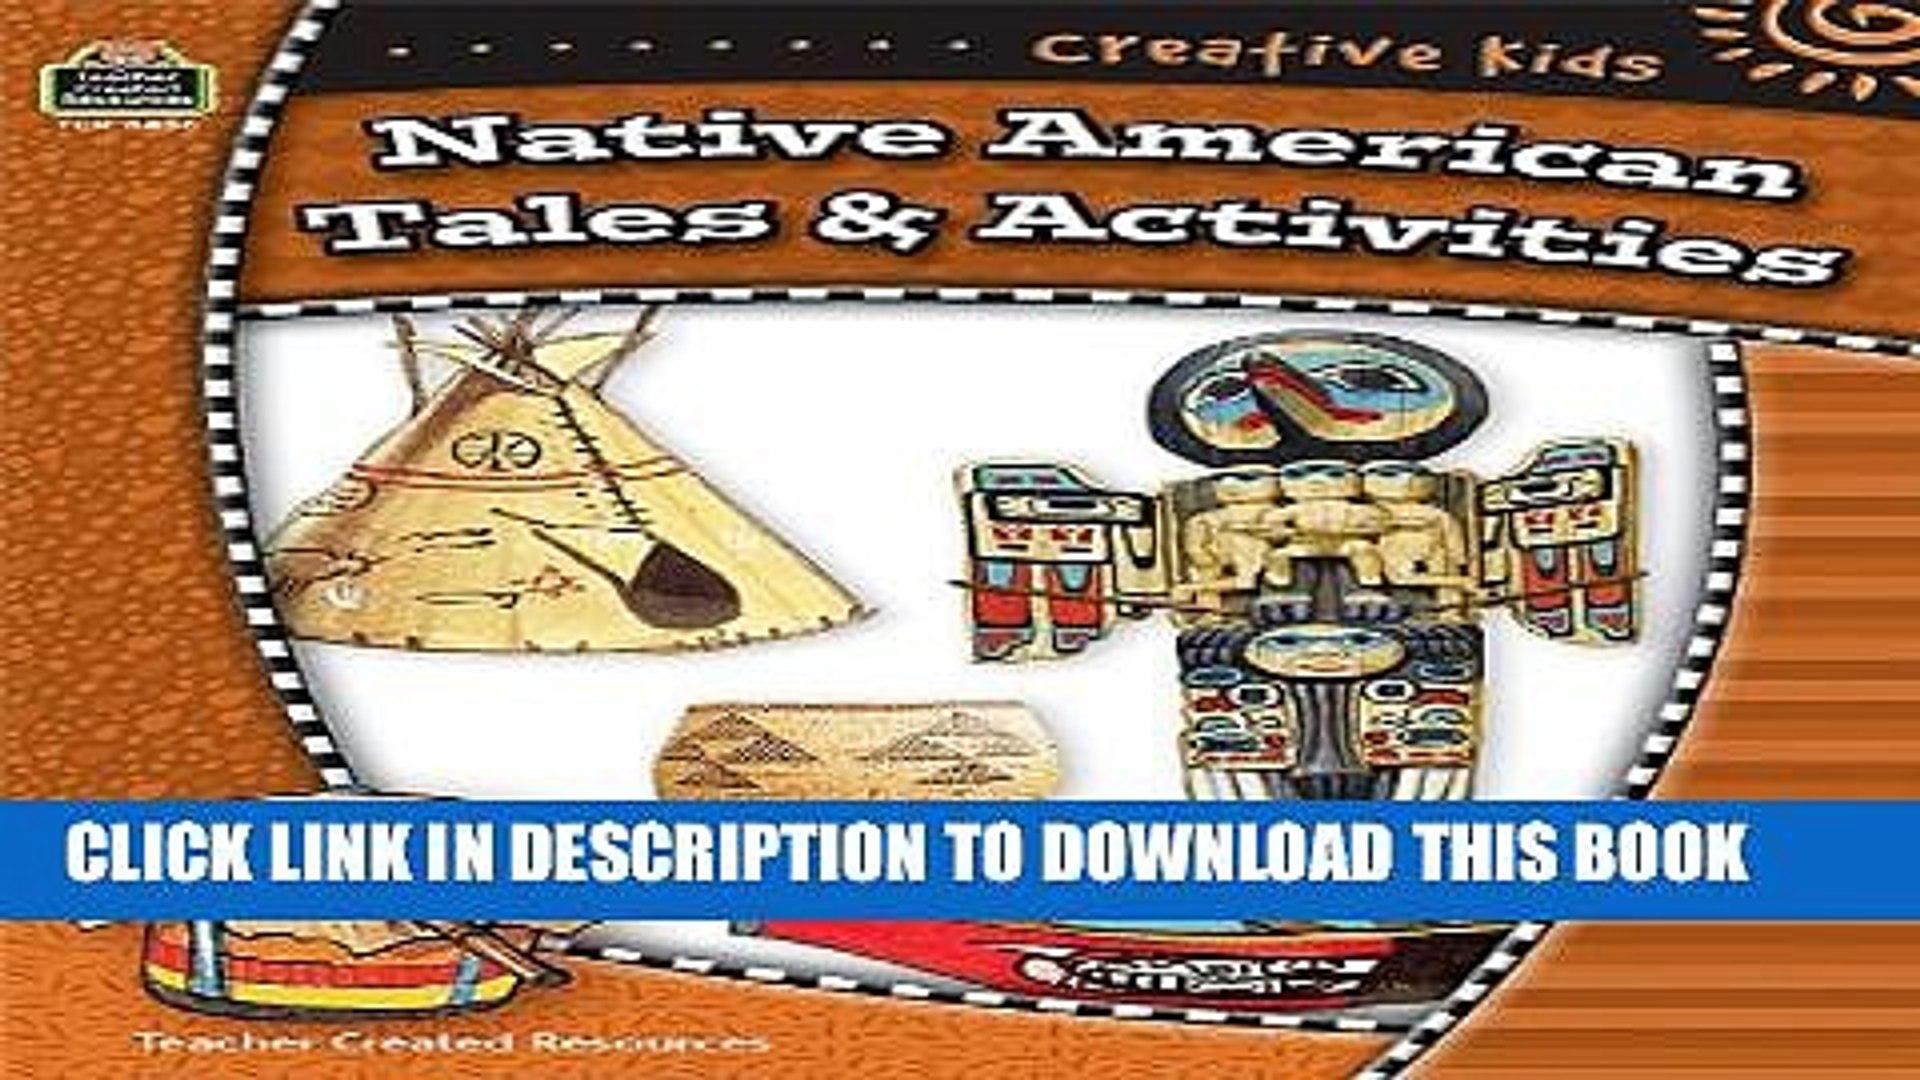 New Book Creative Kids: Native American Tales   Activities